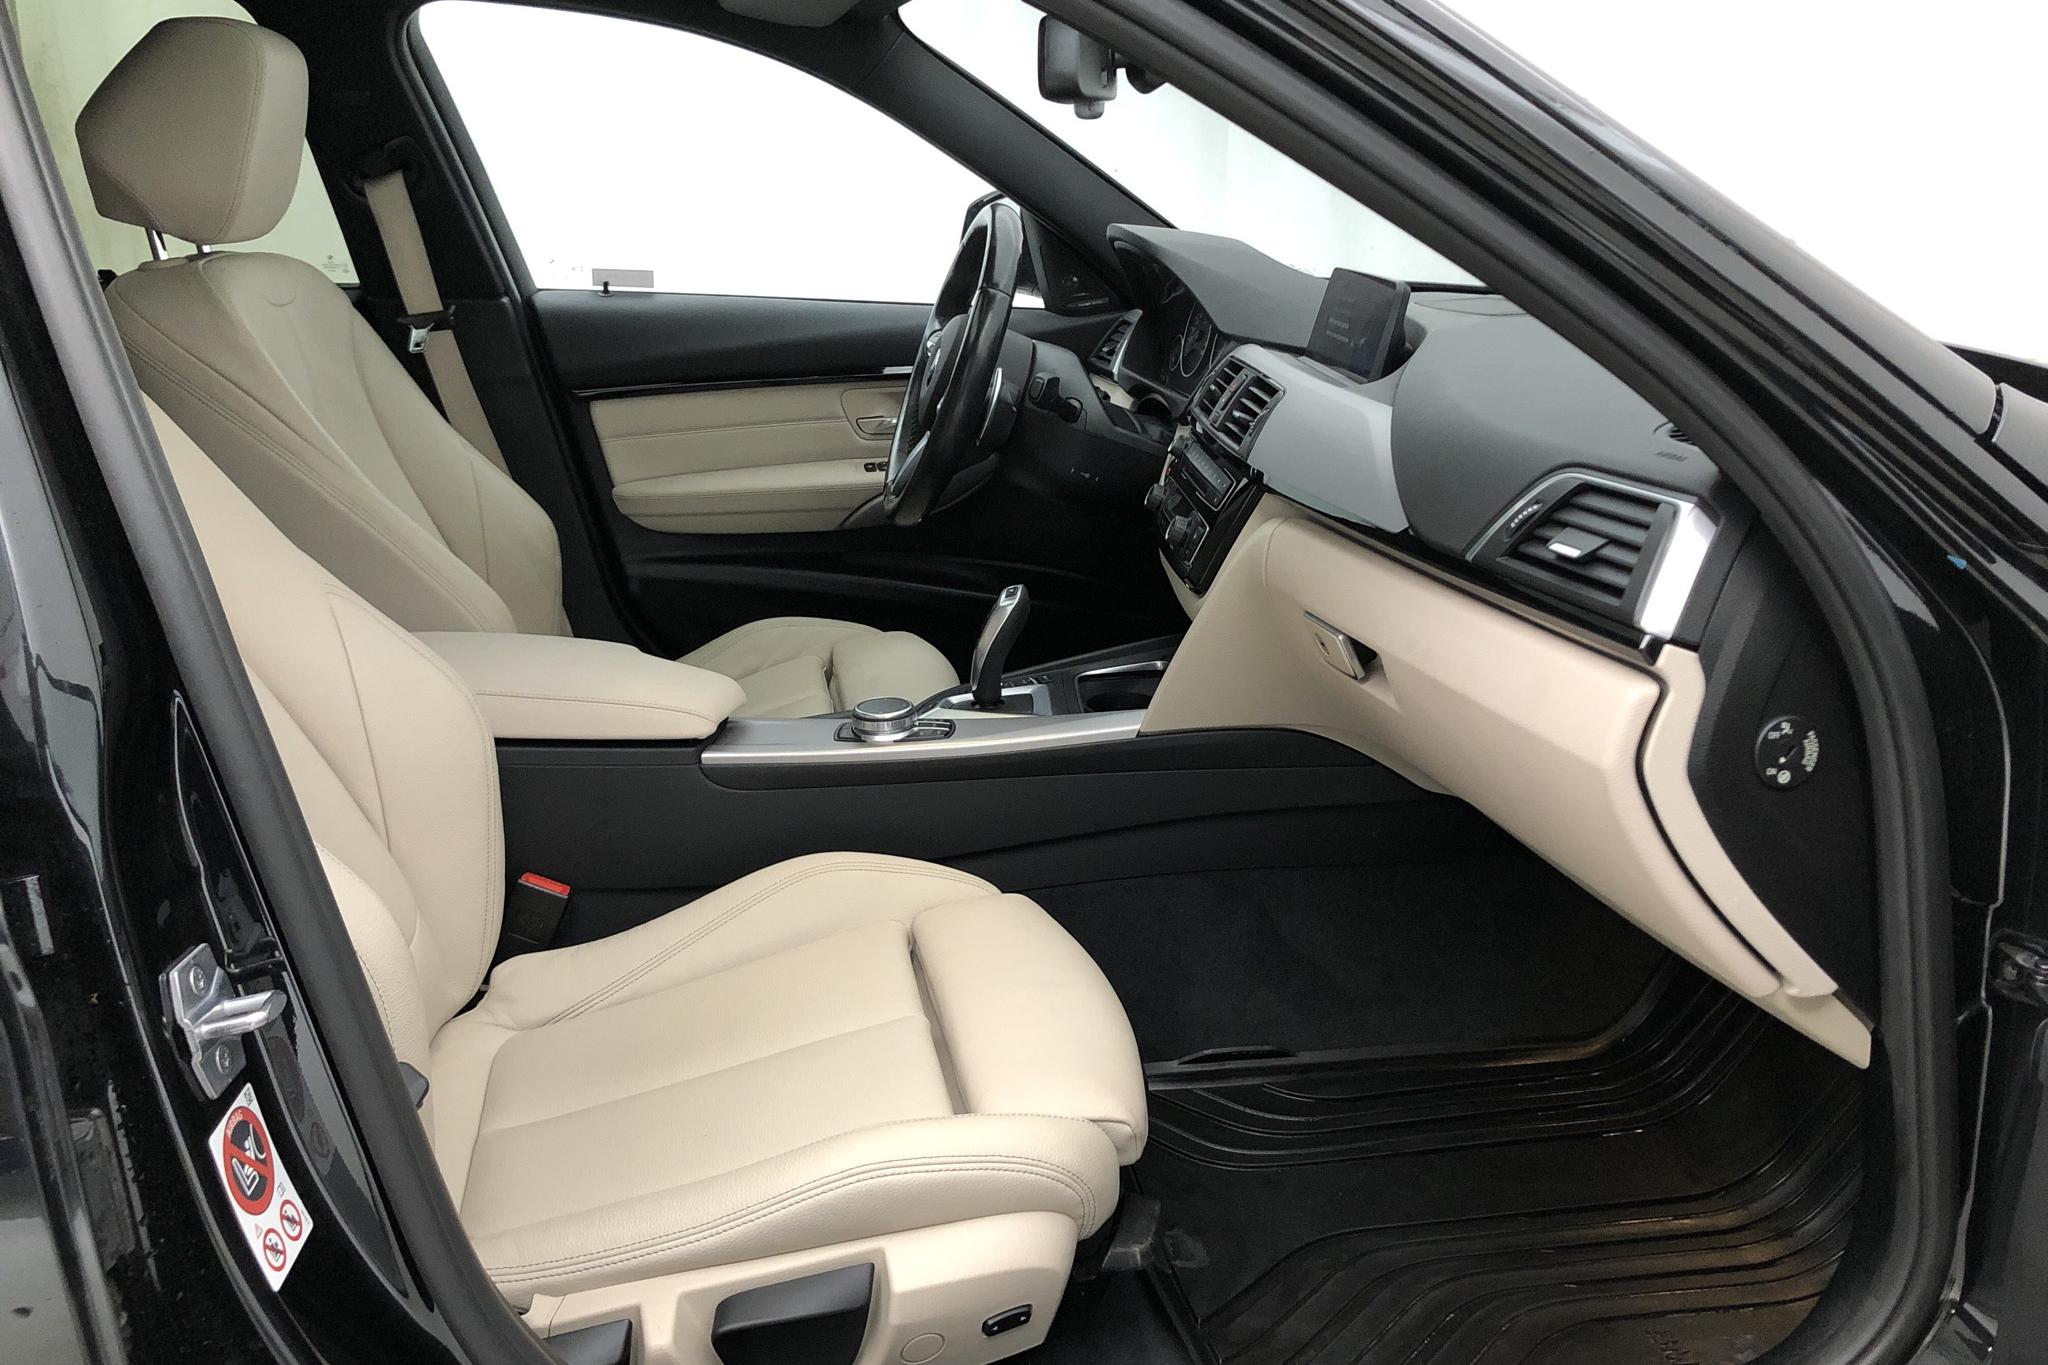 BMW 330e Sedan, F30 (252hk) - 27 250 km - Automatic - black - 2017